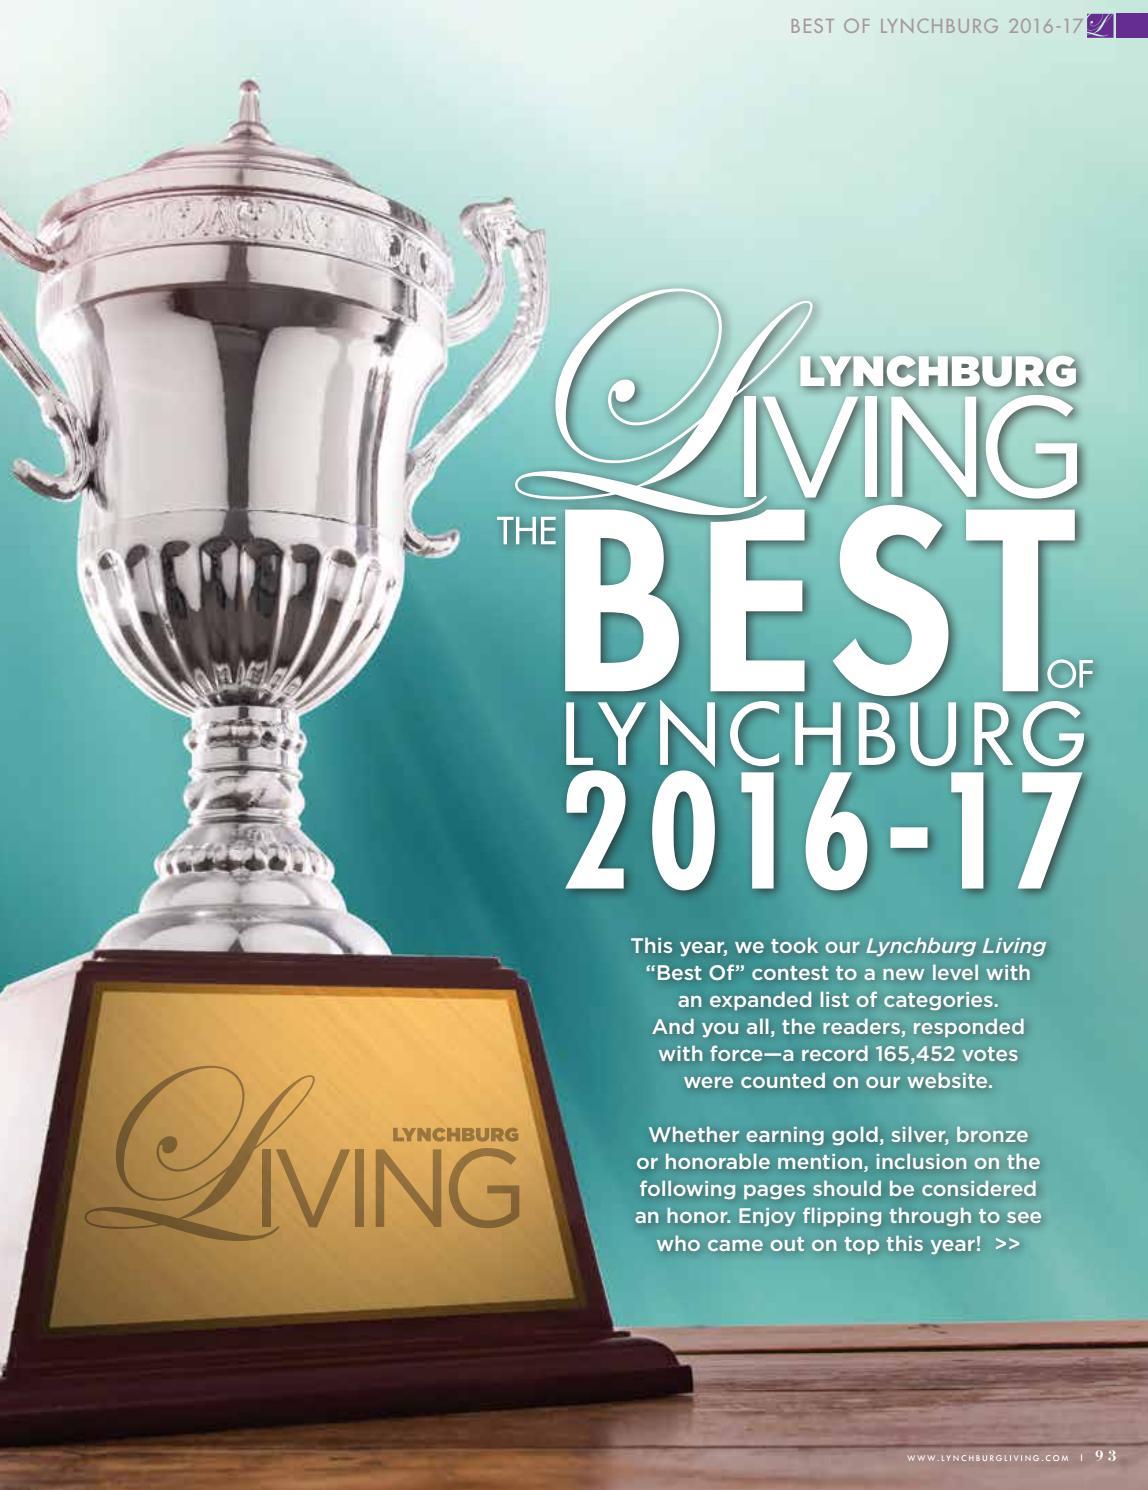 lynchburg living s best of lynchburg by vistagraphics lynchburg living s best of lynchburg 2016 2017 by vistagraphics issuu